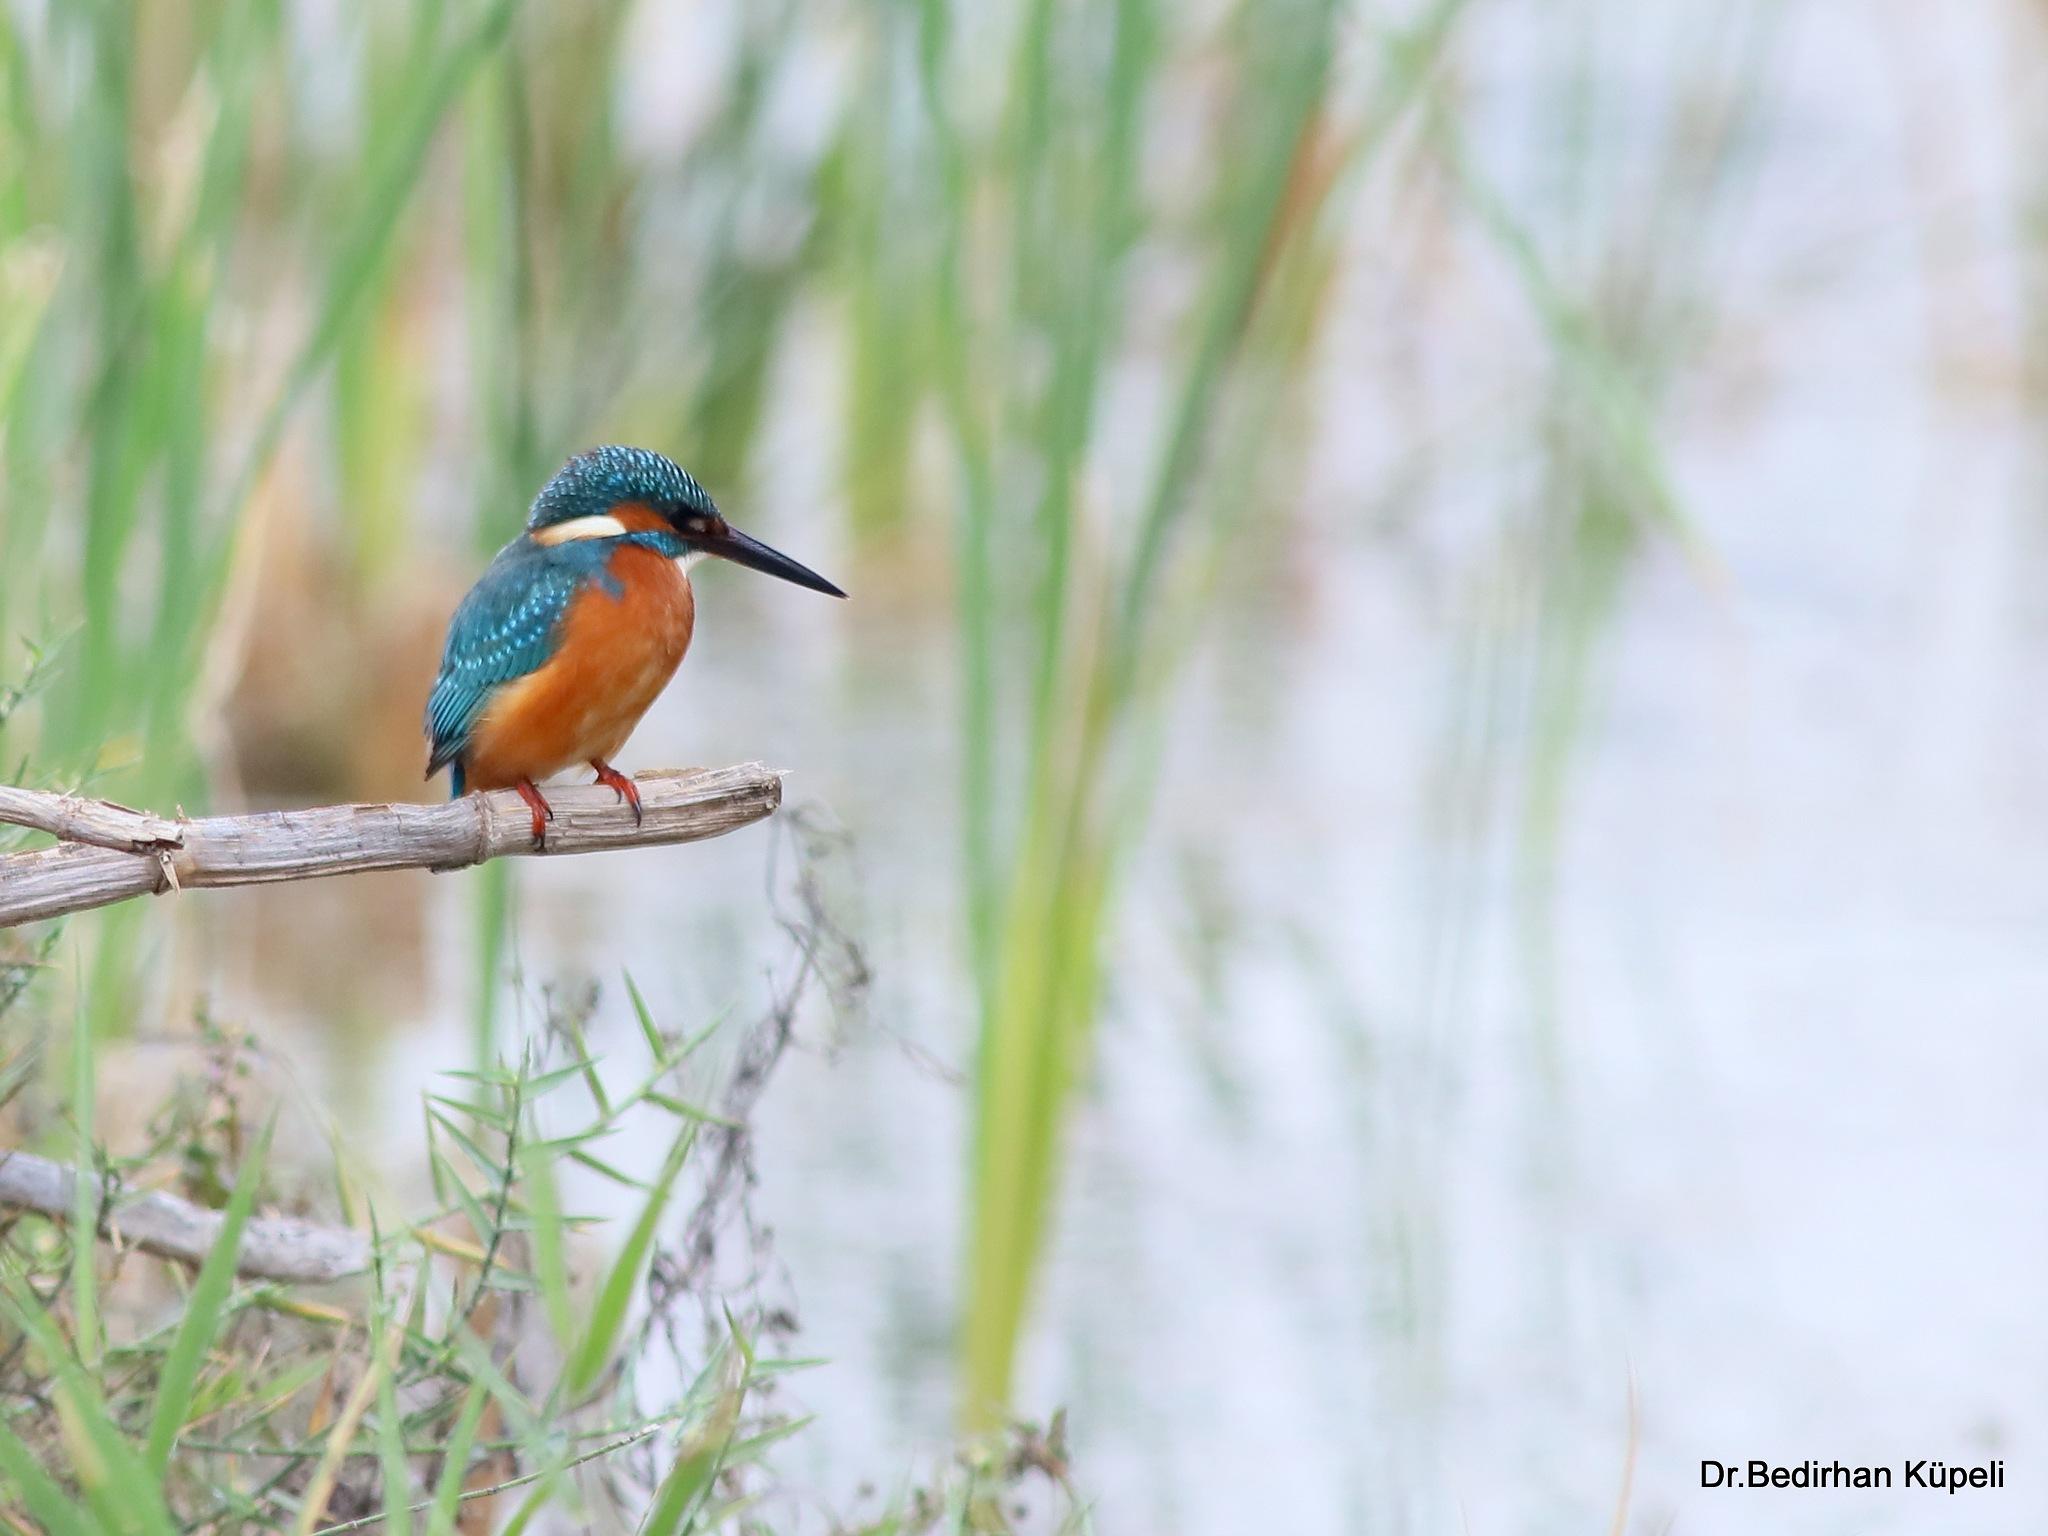 Photo in Animal #kingfisher #bird #animal #nature #bedir #bedirhan #outdoor #canon #ornito #colorful #blue #green #white #black #red #orange #branch #feeding #food #wild #wildlife